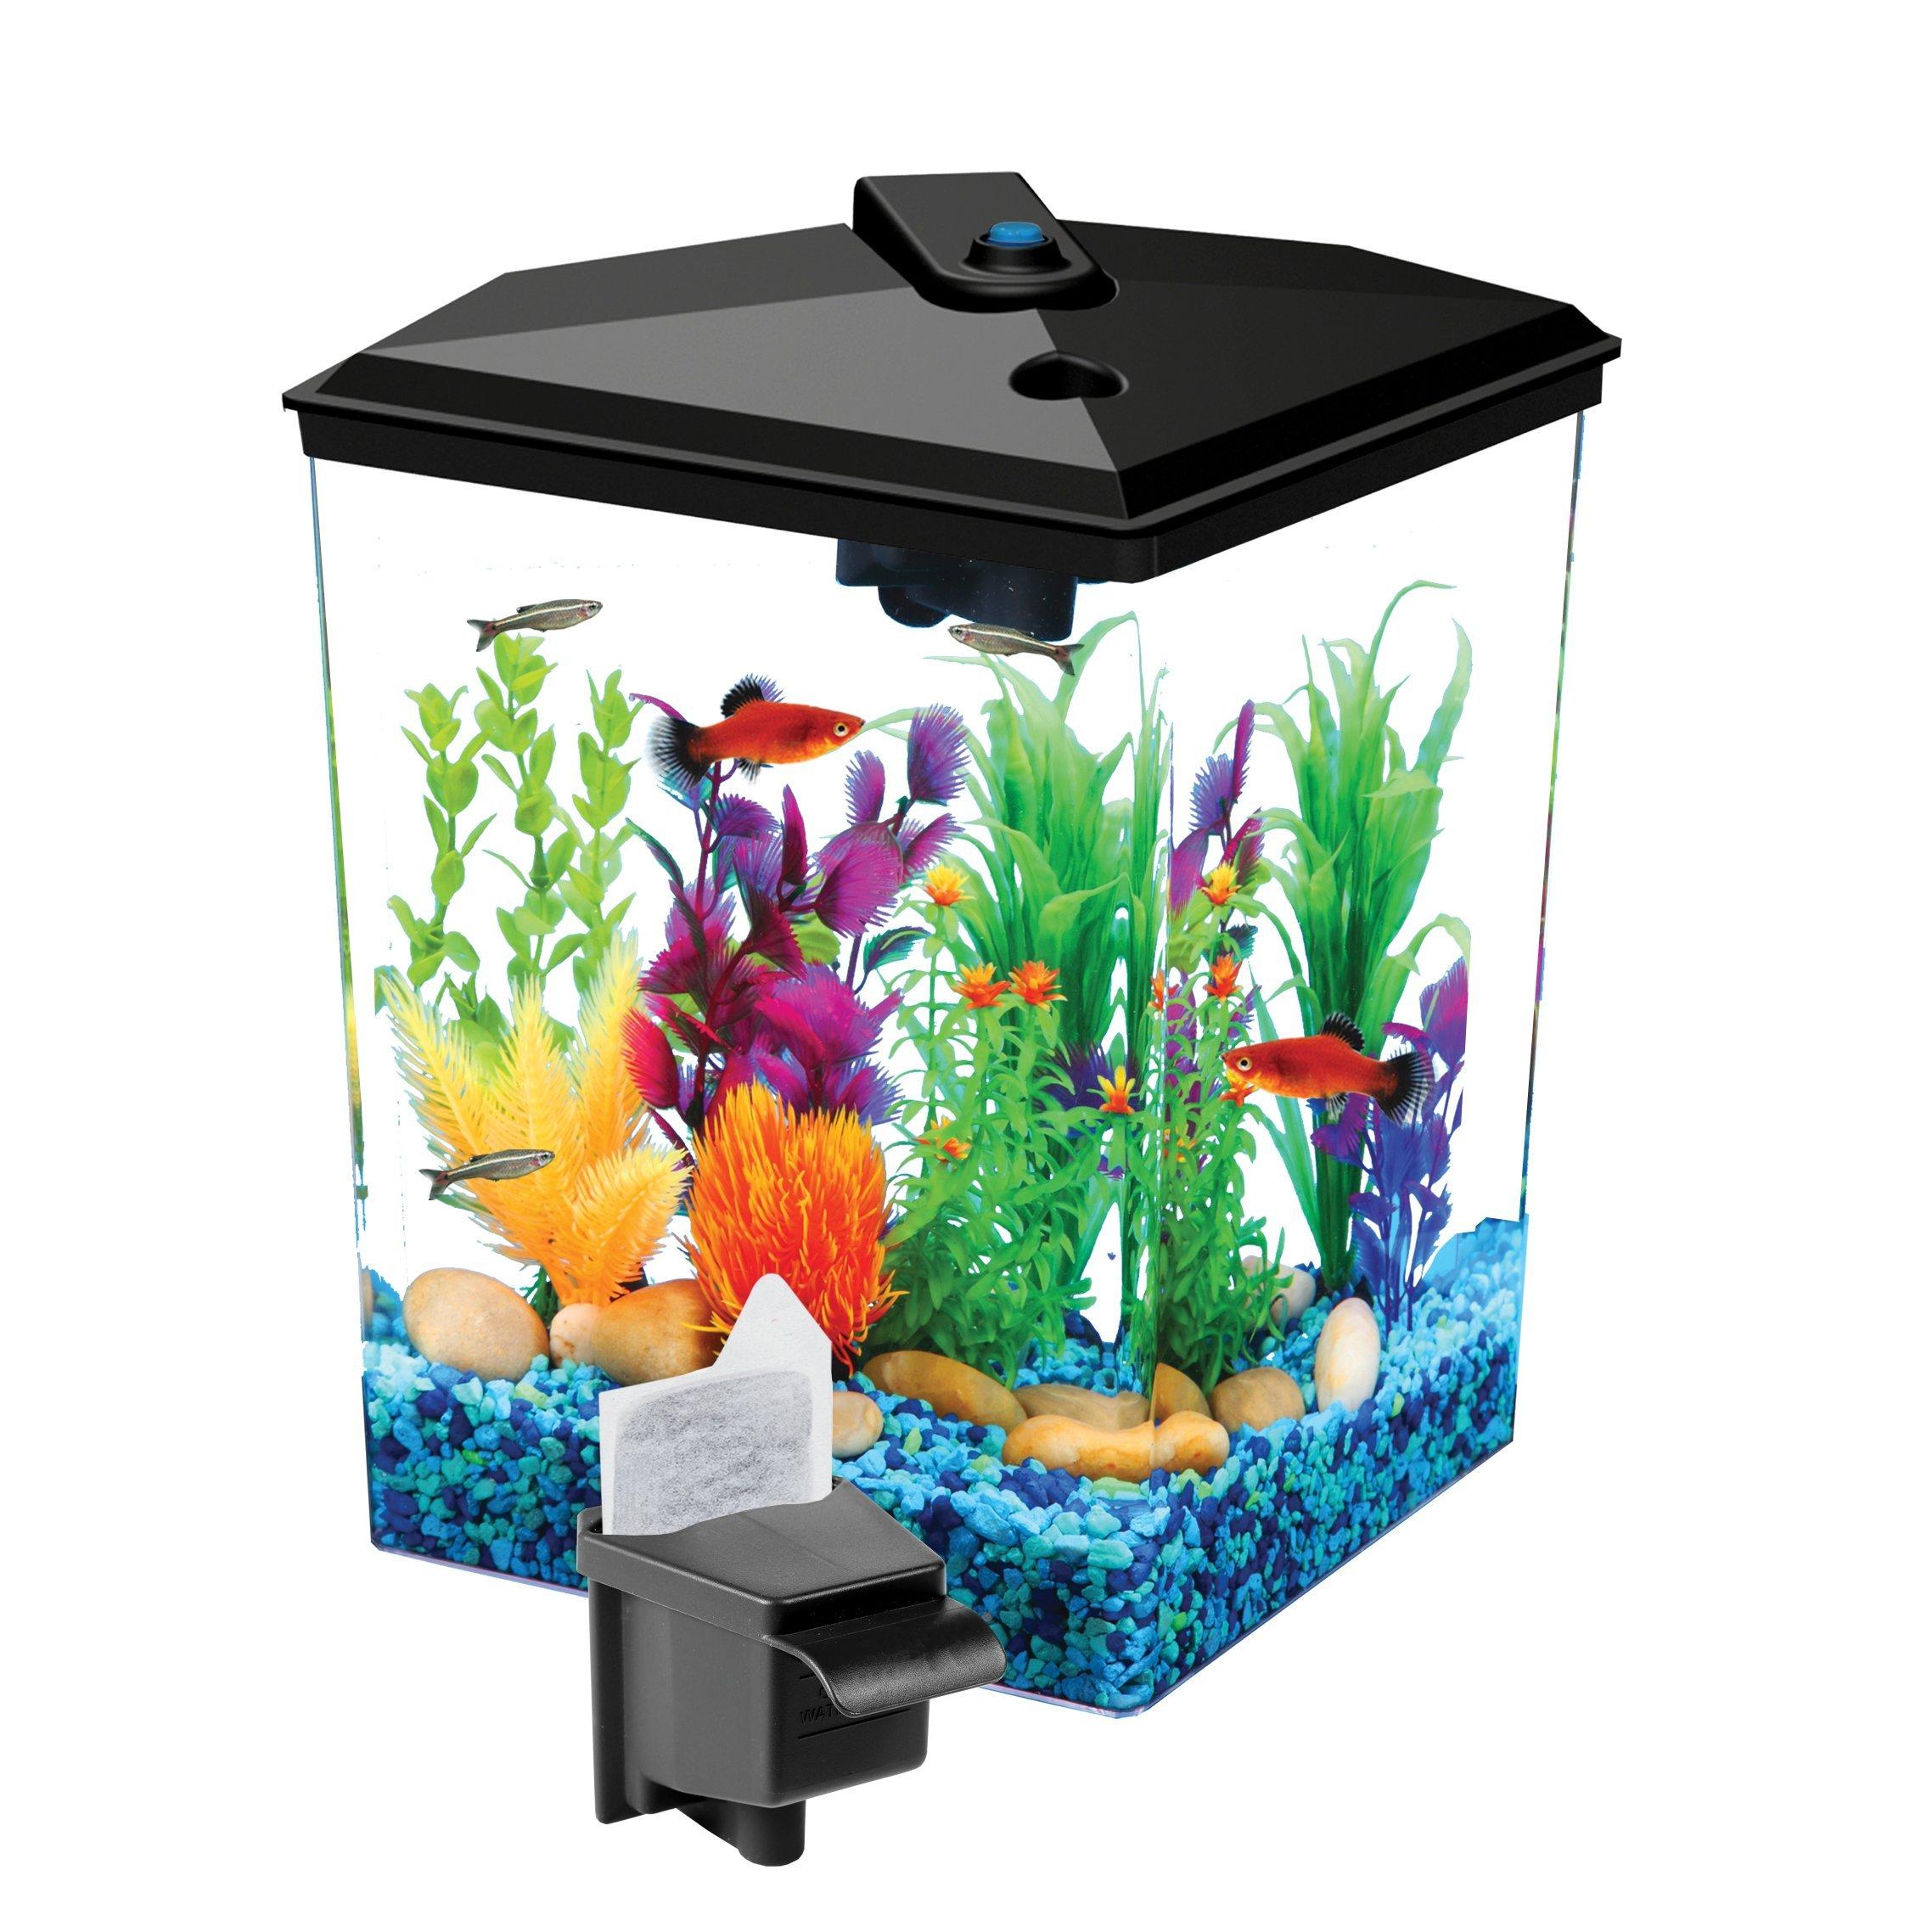 Koller Products 1-Gallon Betta Aquarium Kit, LED Light, Power Filter, and Betta Fish Tank, AP11104FFP by Koller Products